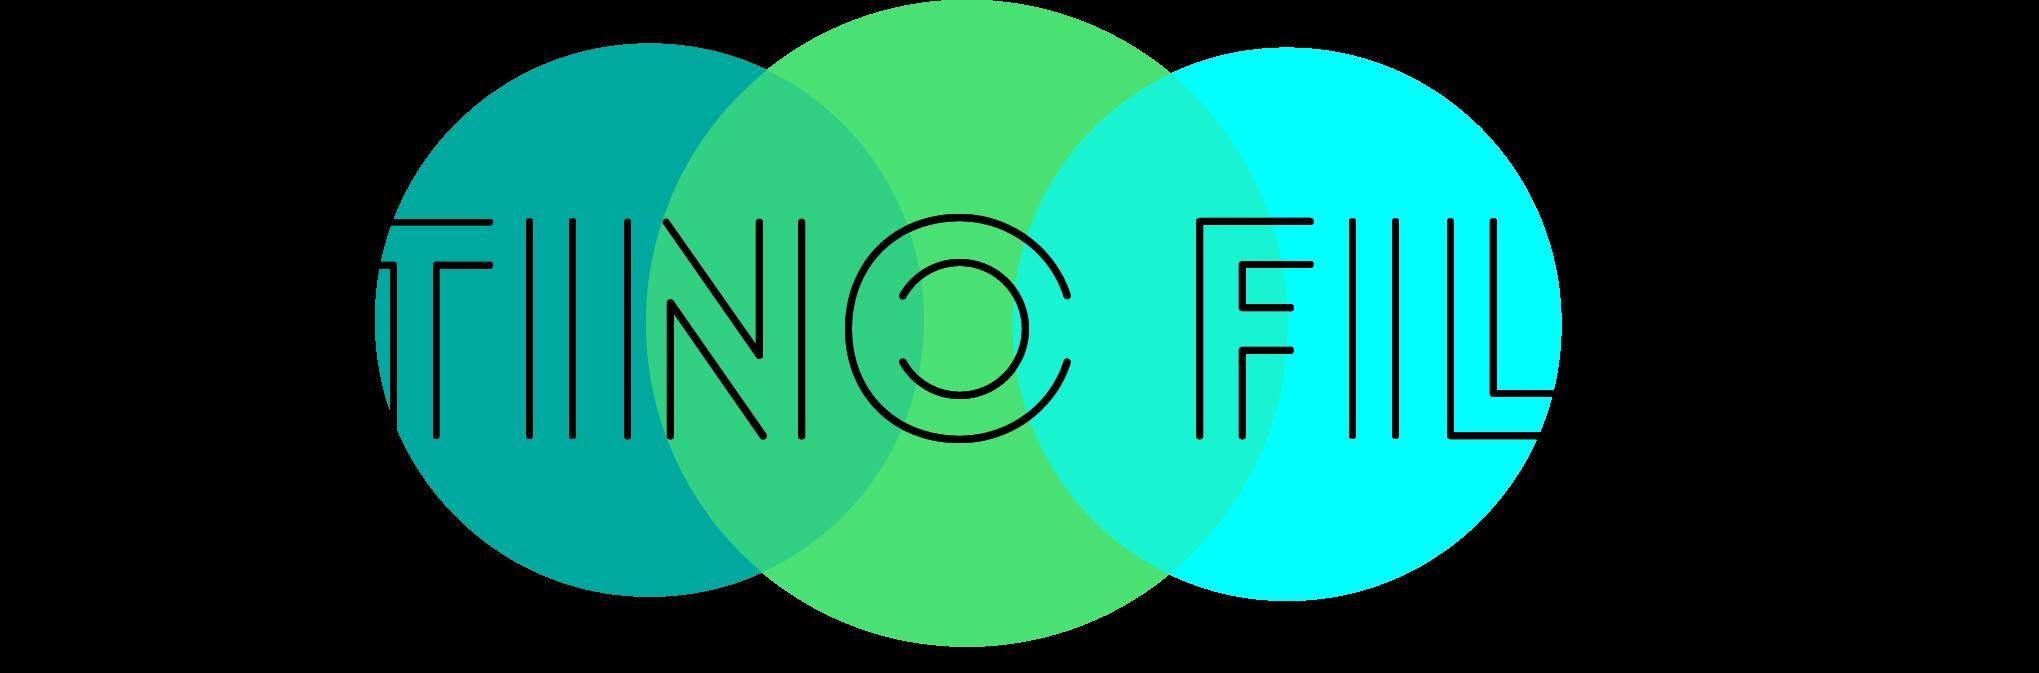 Tatino Films - Full Circle Lab